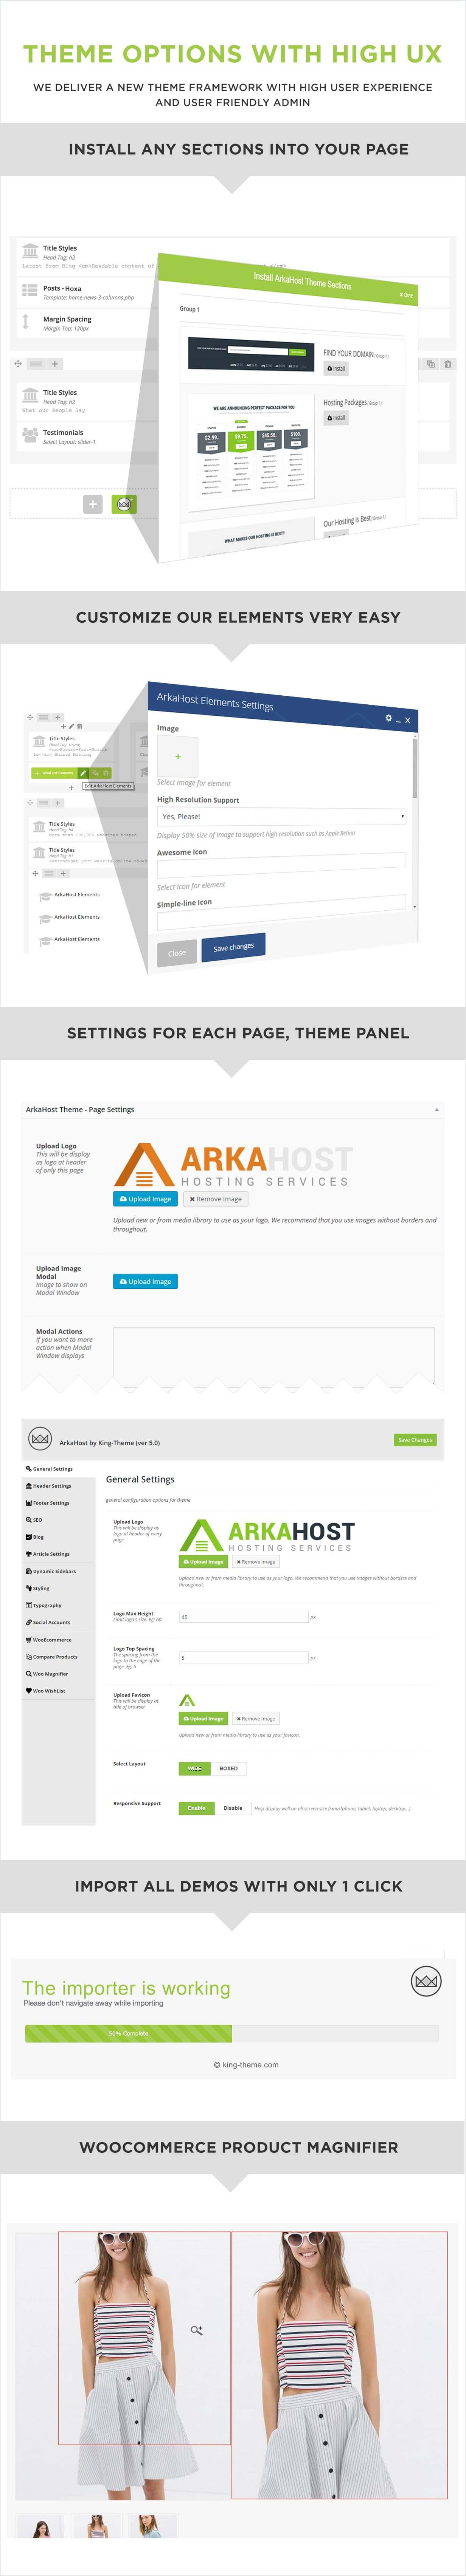 ArkaHost WordPress Hosting Theme Description 7